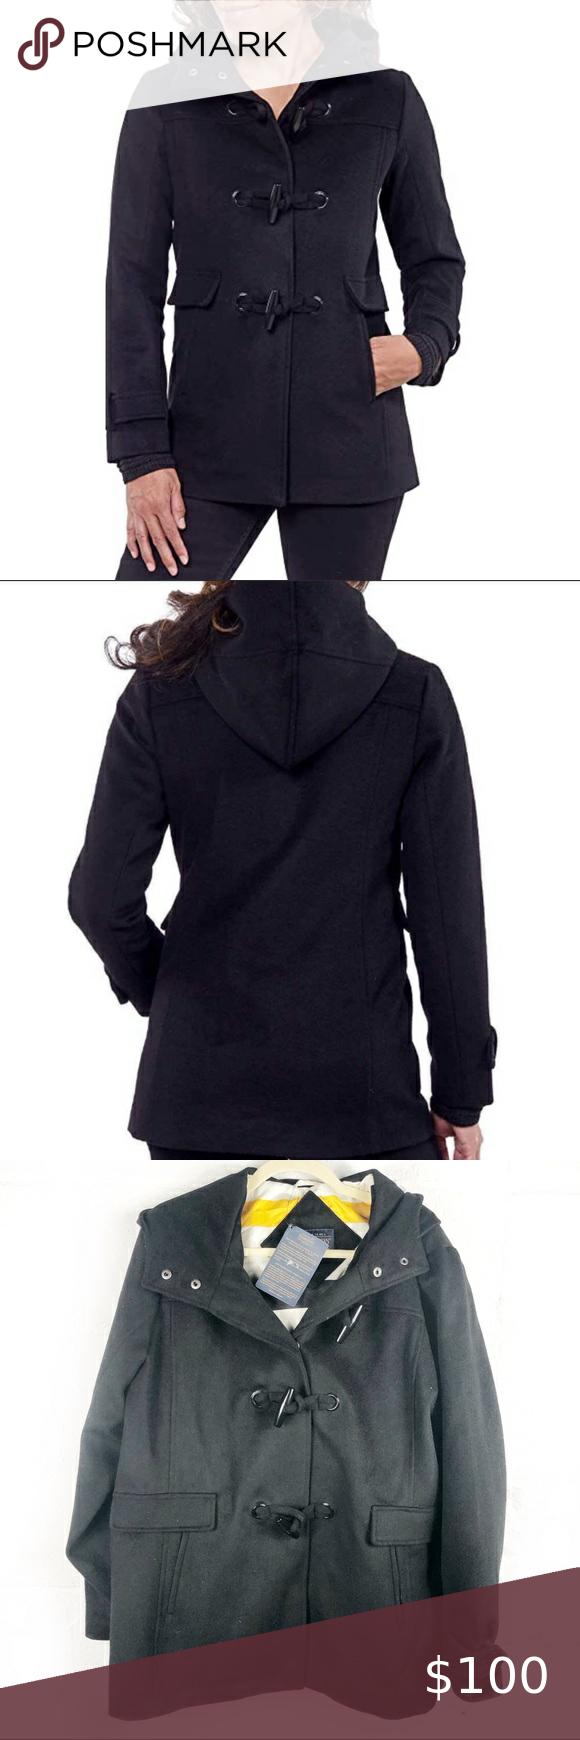 New Pendleton Toggle Button Wool Hooded Coat New Pendleton Women S Toggle Button Wool Blend Hooded Coat Black Sz Xxl Poc Hooded Wool Coat Hooded Coat Pendleton [ 1740 x 580 Pixel ]